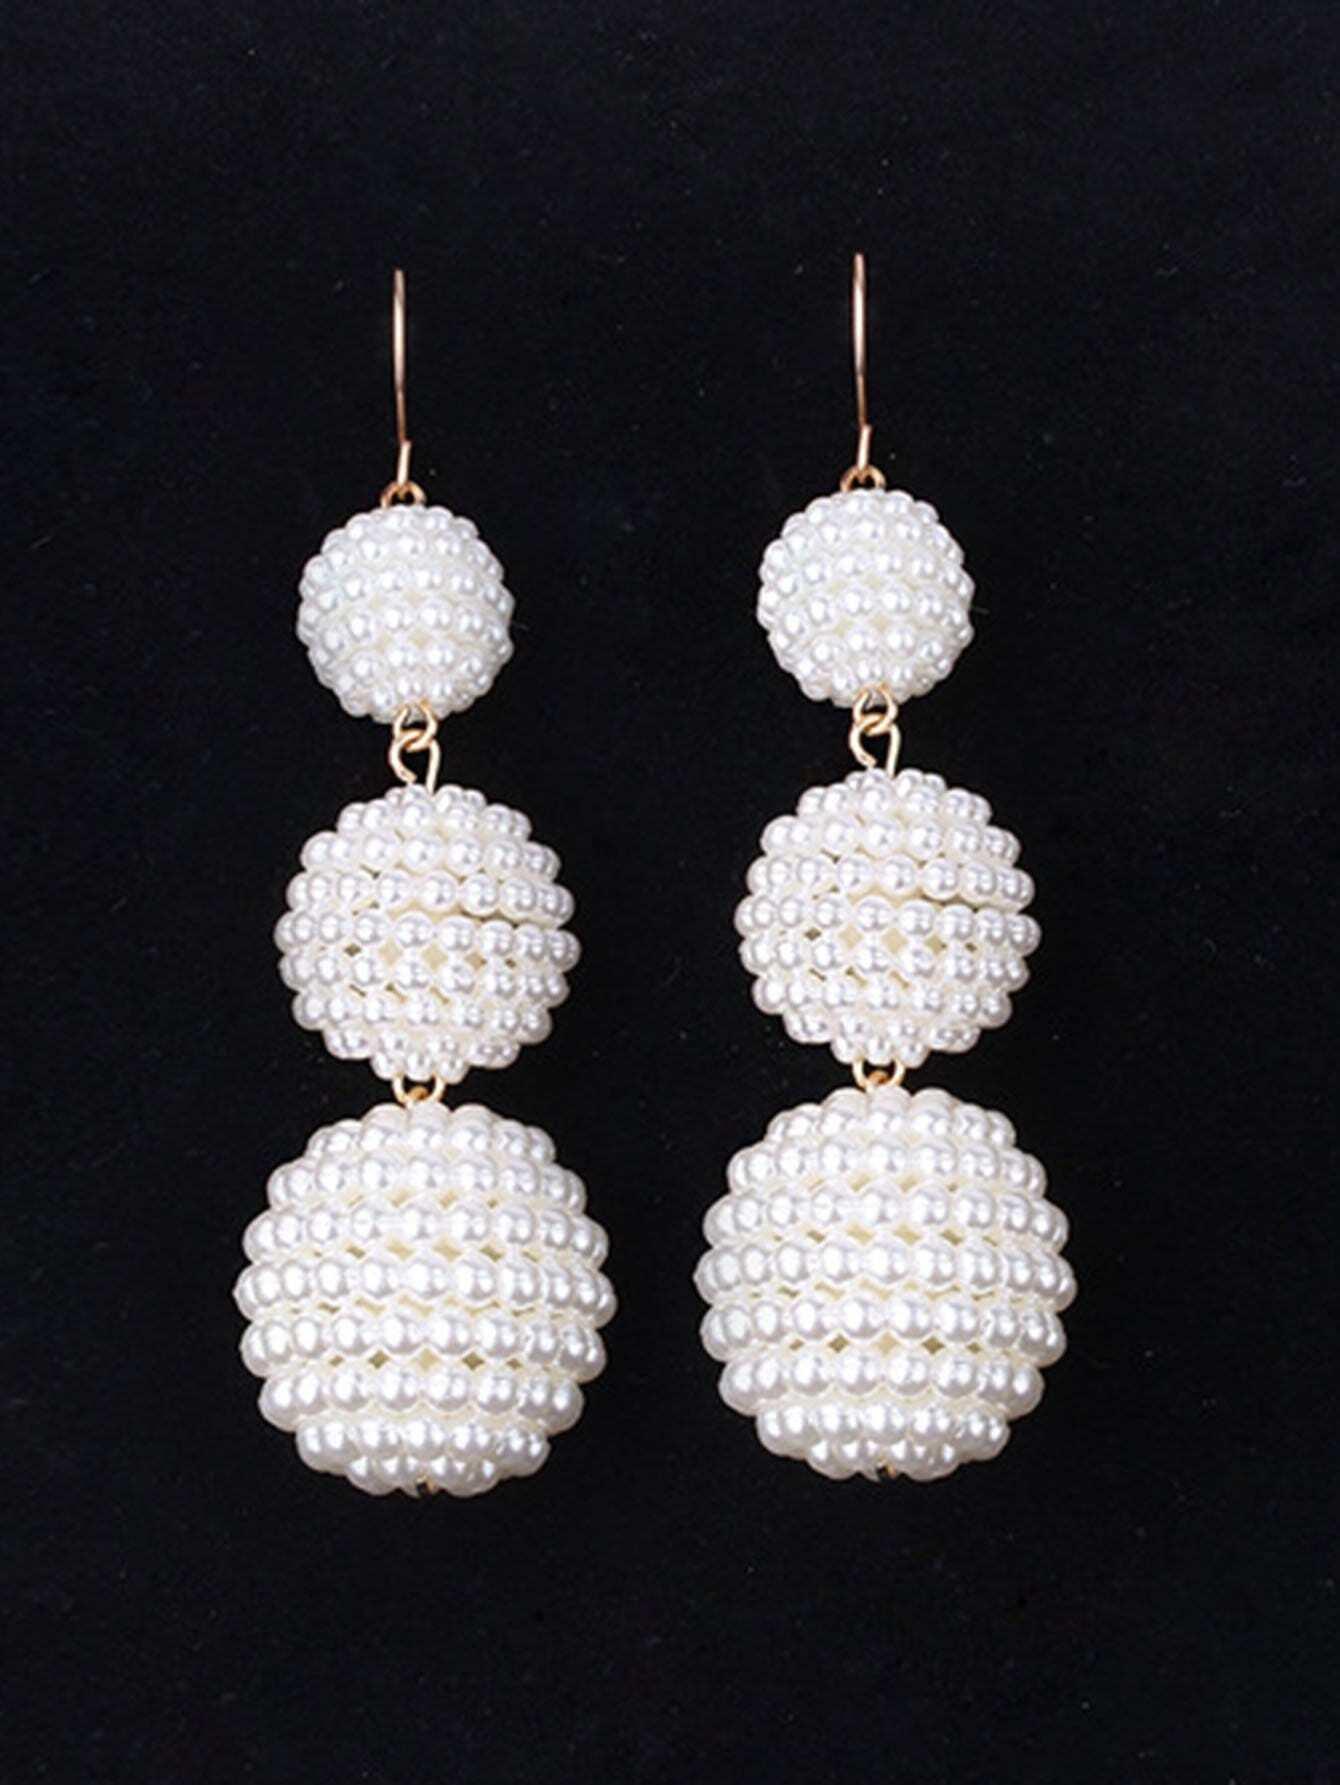 Faux Pearl Ball Design Drop Earrings hollowed circle faux pearl drop earrings